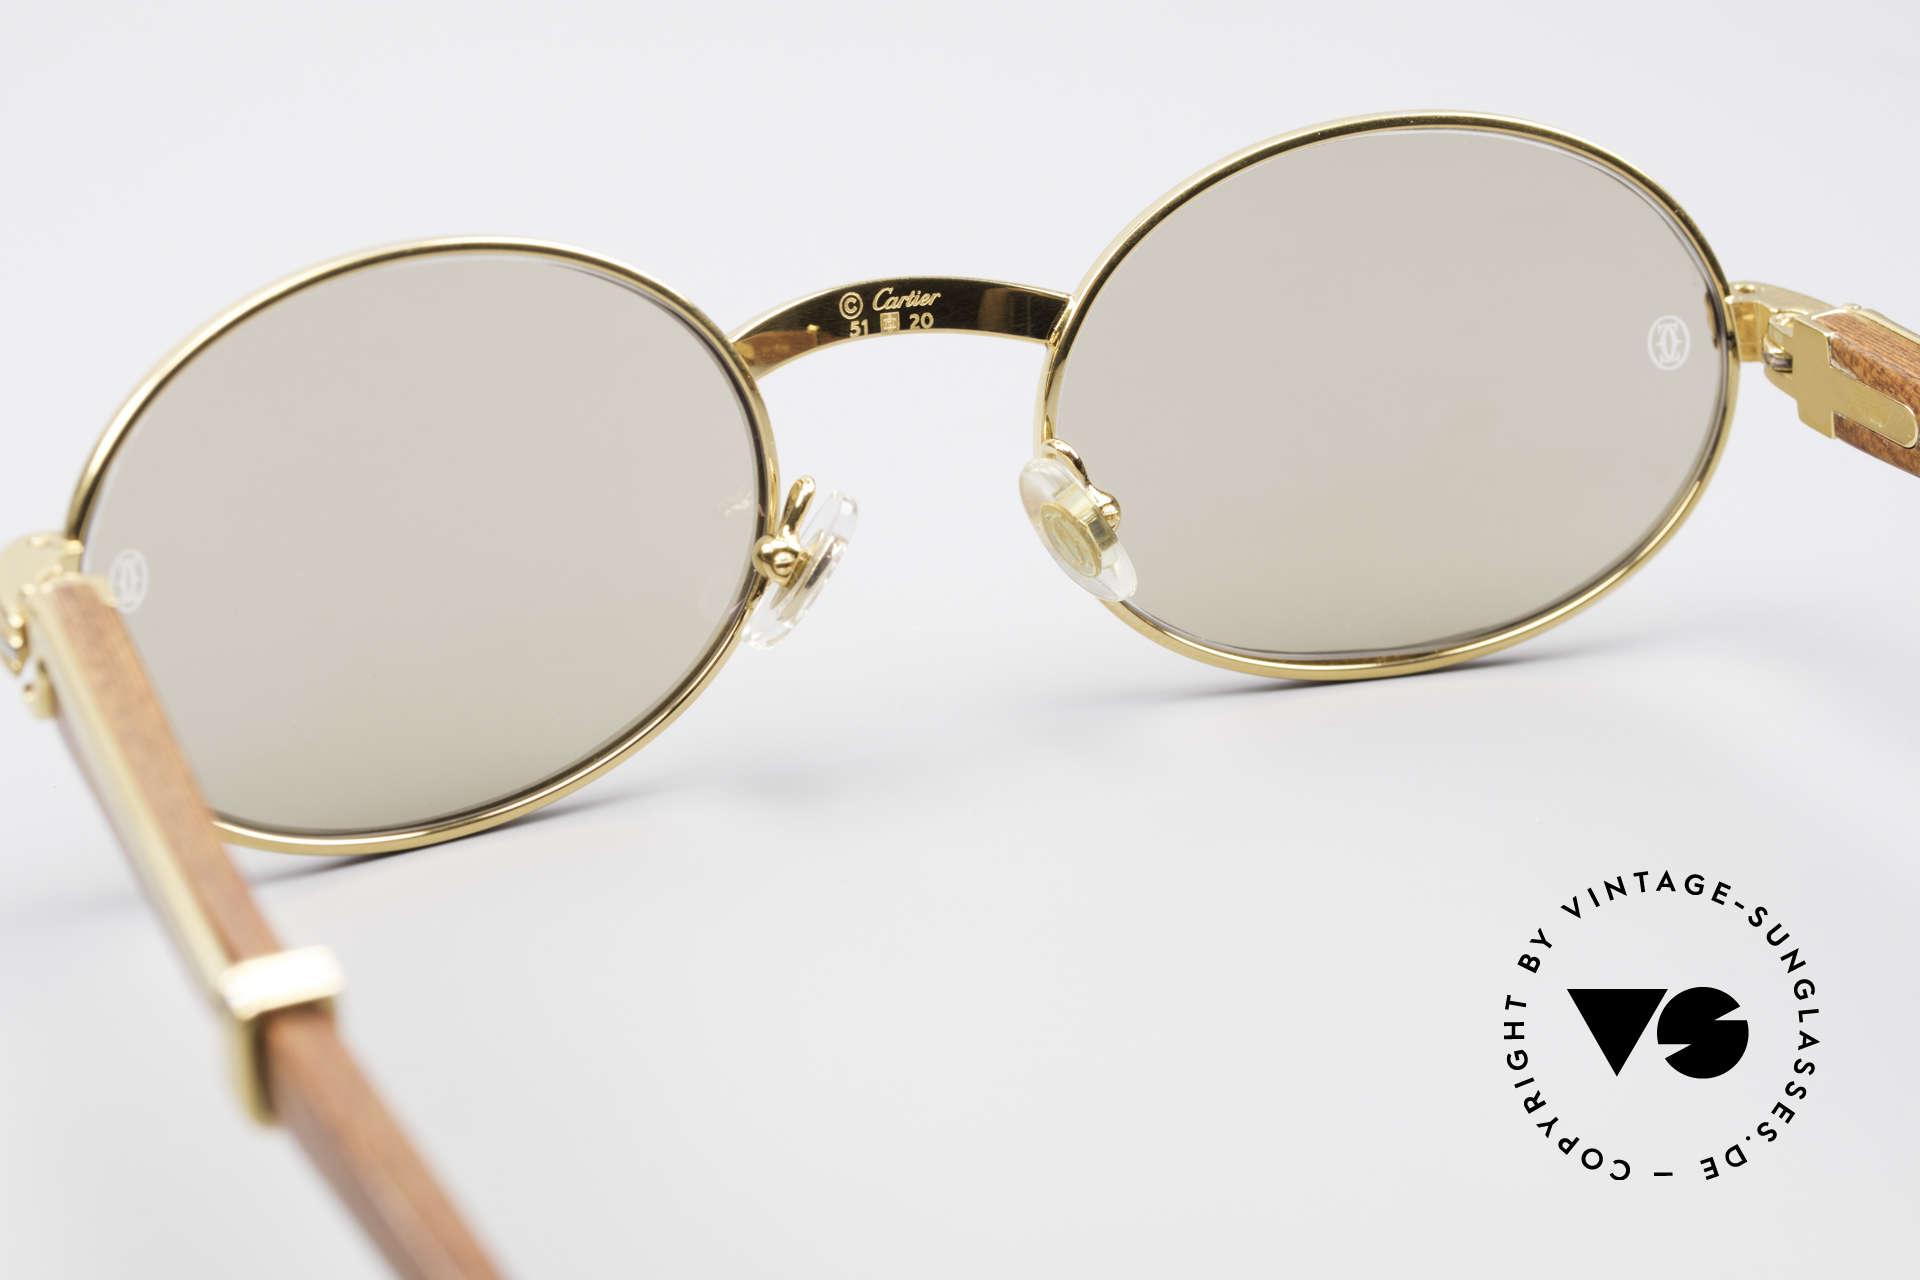 3c389315b380 Sunglasses Cartier Giverny Oval Wood Sunglasses